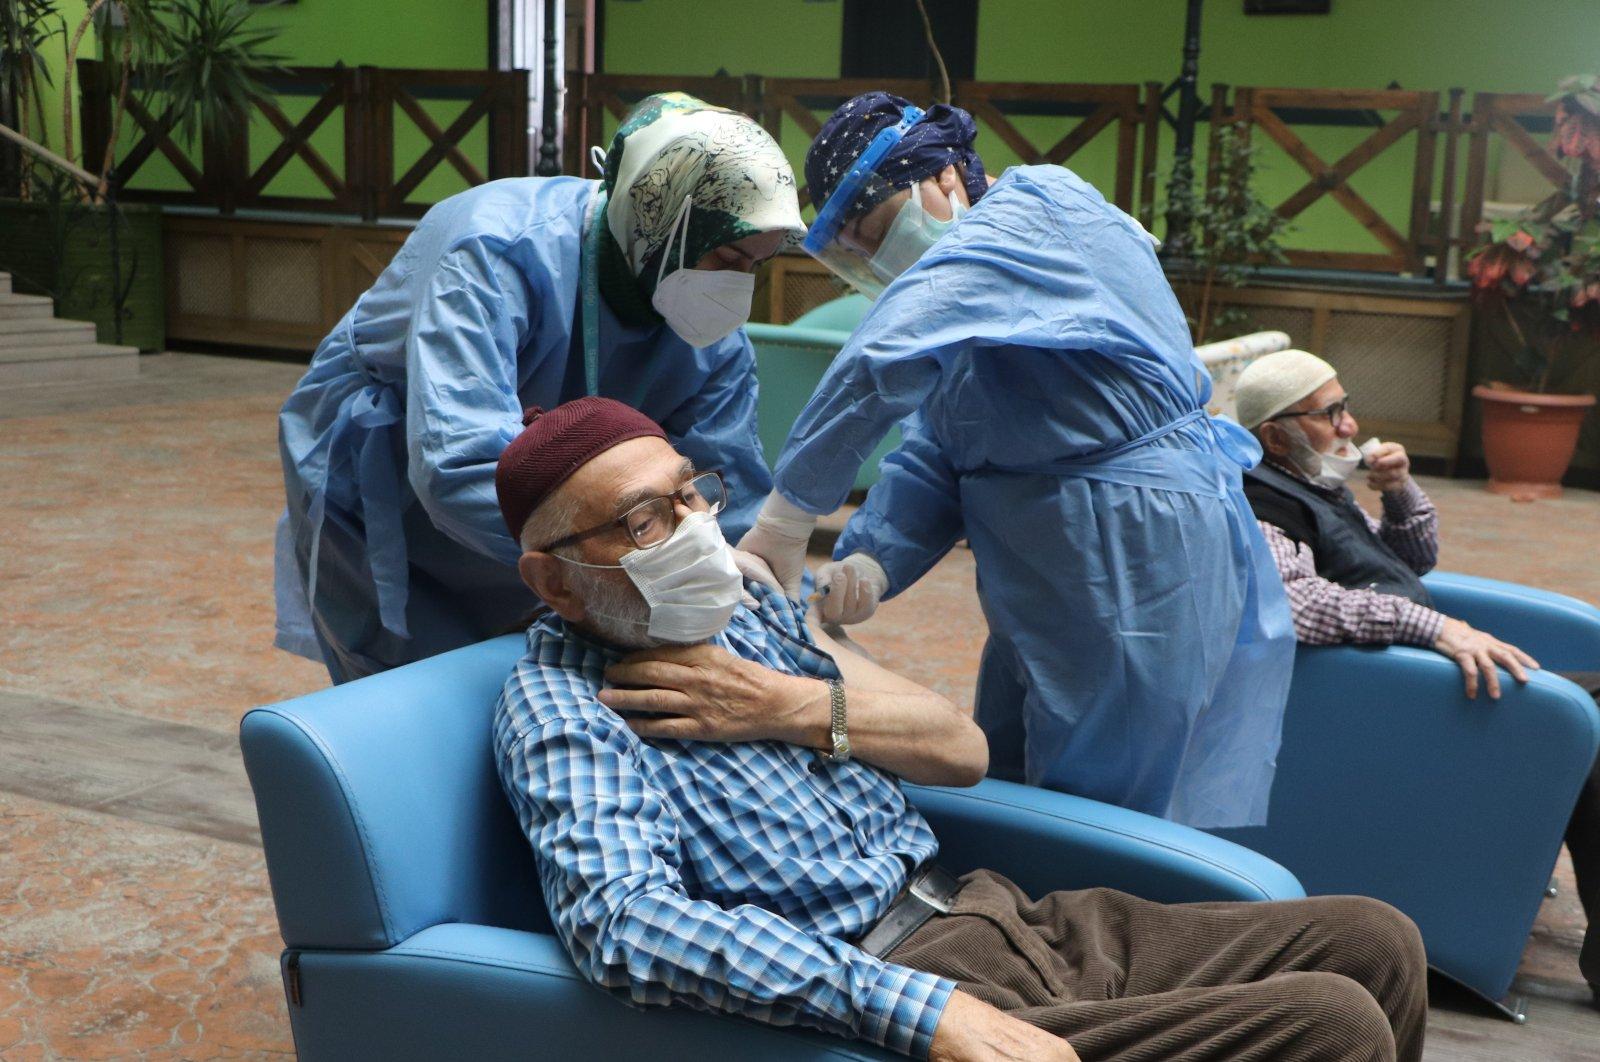 An elderly man gets COVID-19 jab at a nursing home in Samsun, northern Turkey, Feb. 22, 2021. (İHA PHOTO)